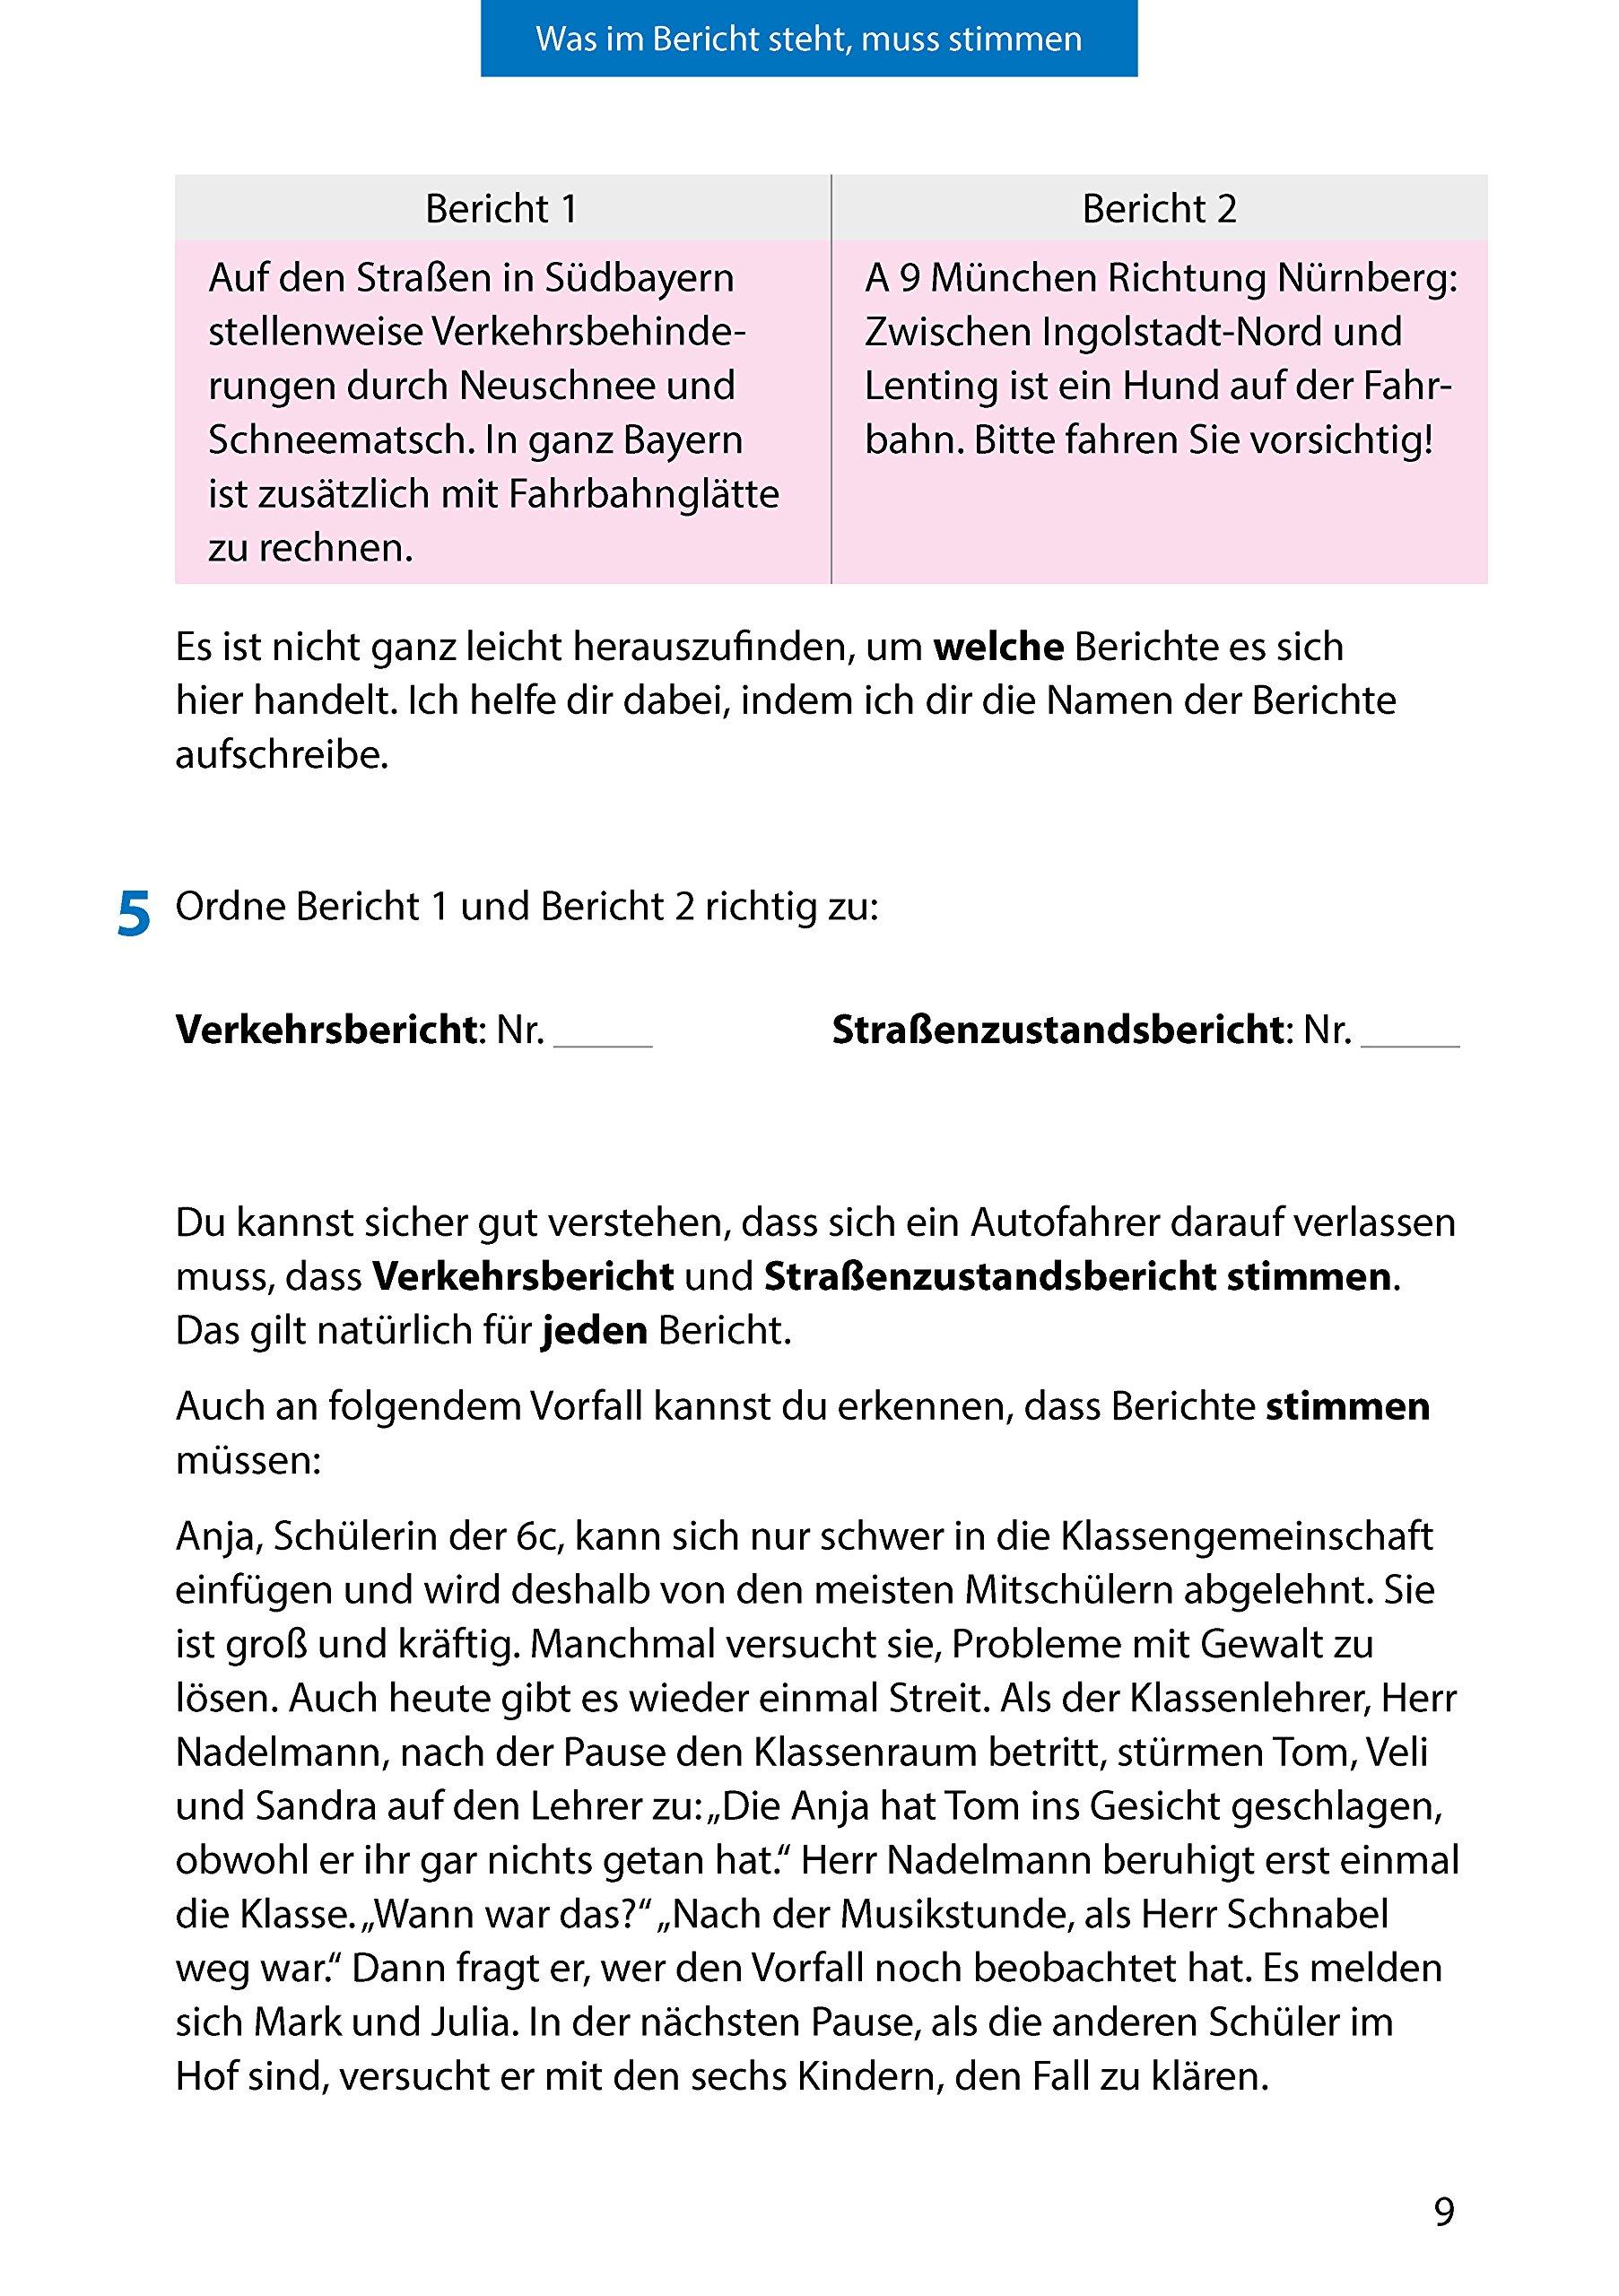 Bericht. Aufsatz 5.-7. Klasse: Amazon.de: Gerhard Widmann, Martina ...